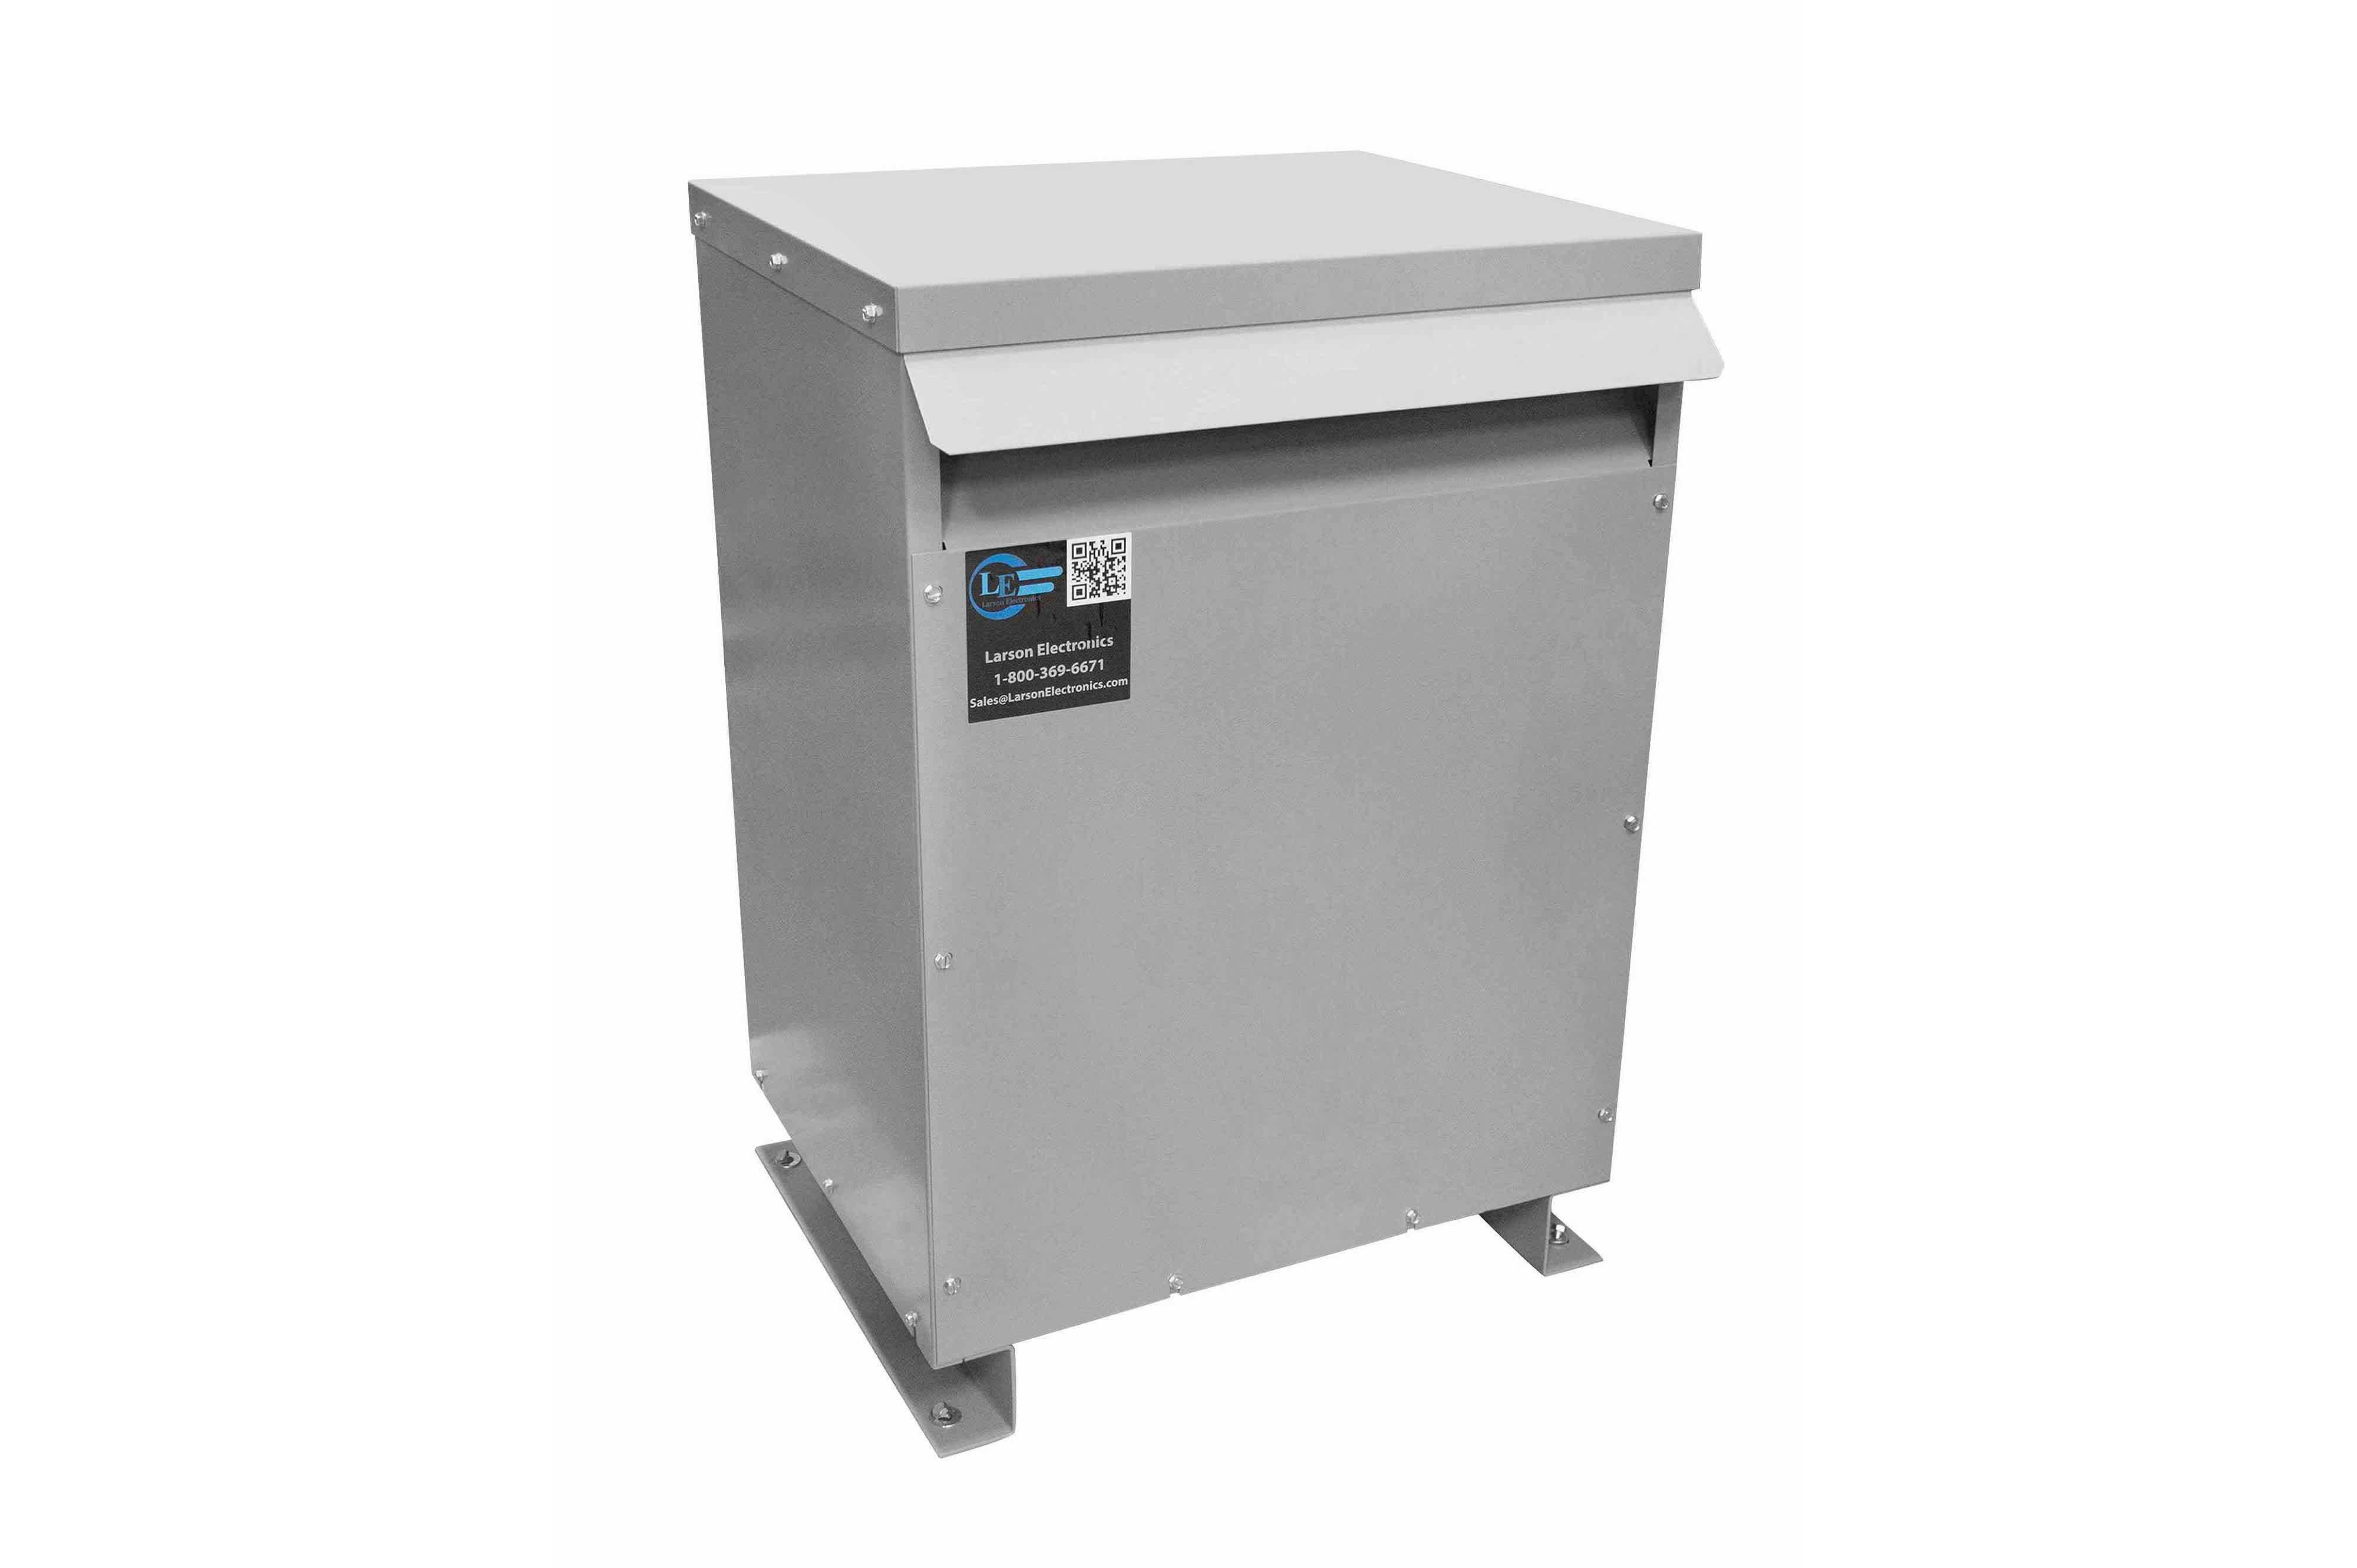 75 kVA 3PH Isolation Transformer, 400V Wye Primary, 240V/120 Delta Secondary, N3R, Ventilated, 60 Hz